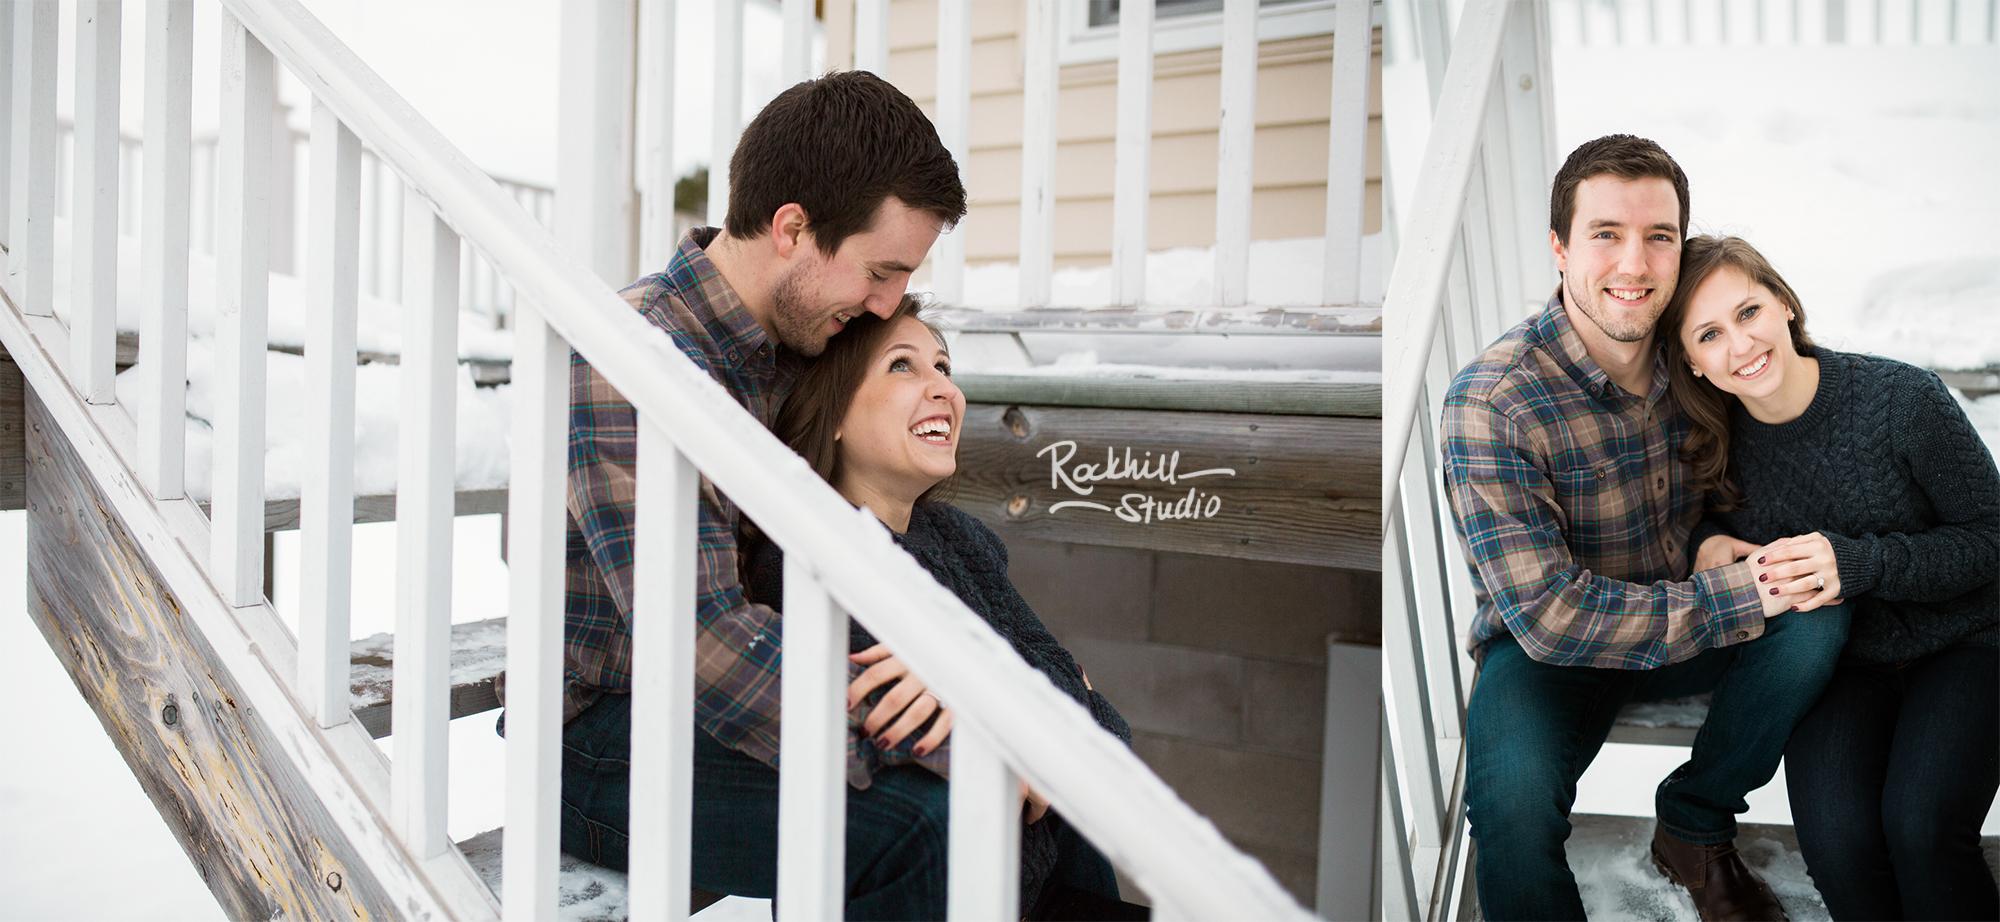 northern-michigan-upper-peninsula-engagement-photography-wedding-rockhill-studio-marquette-4.jpg